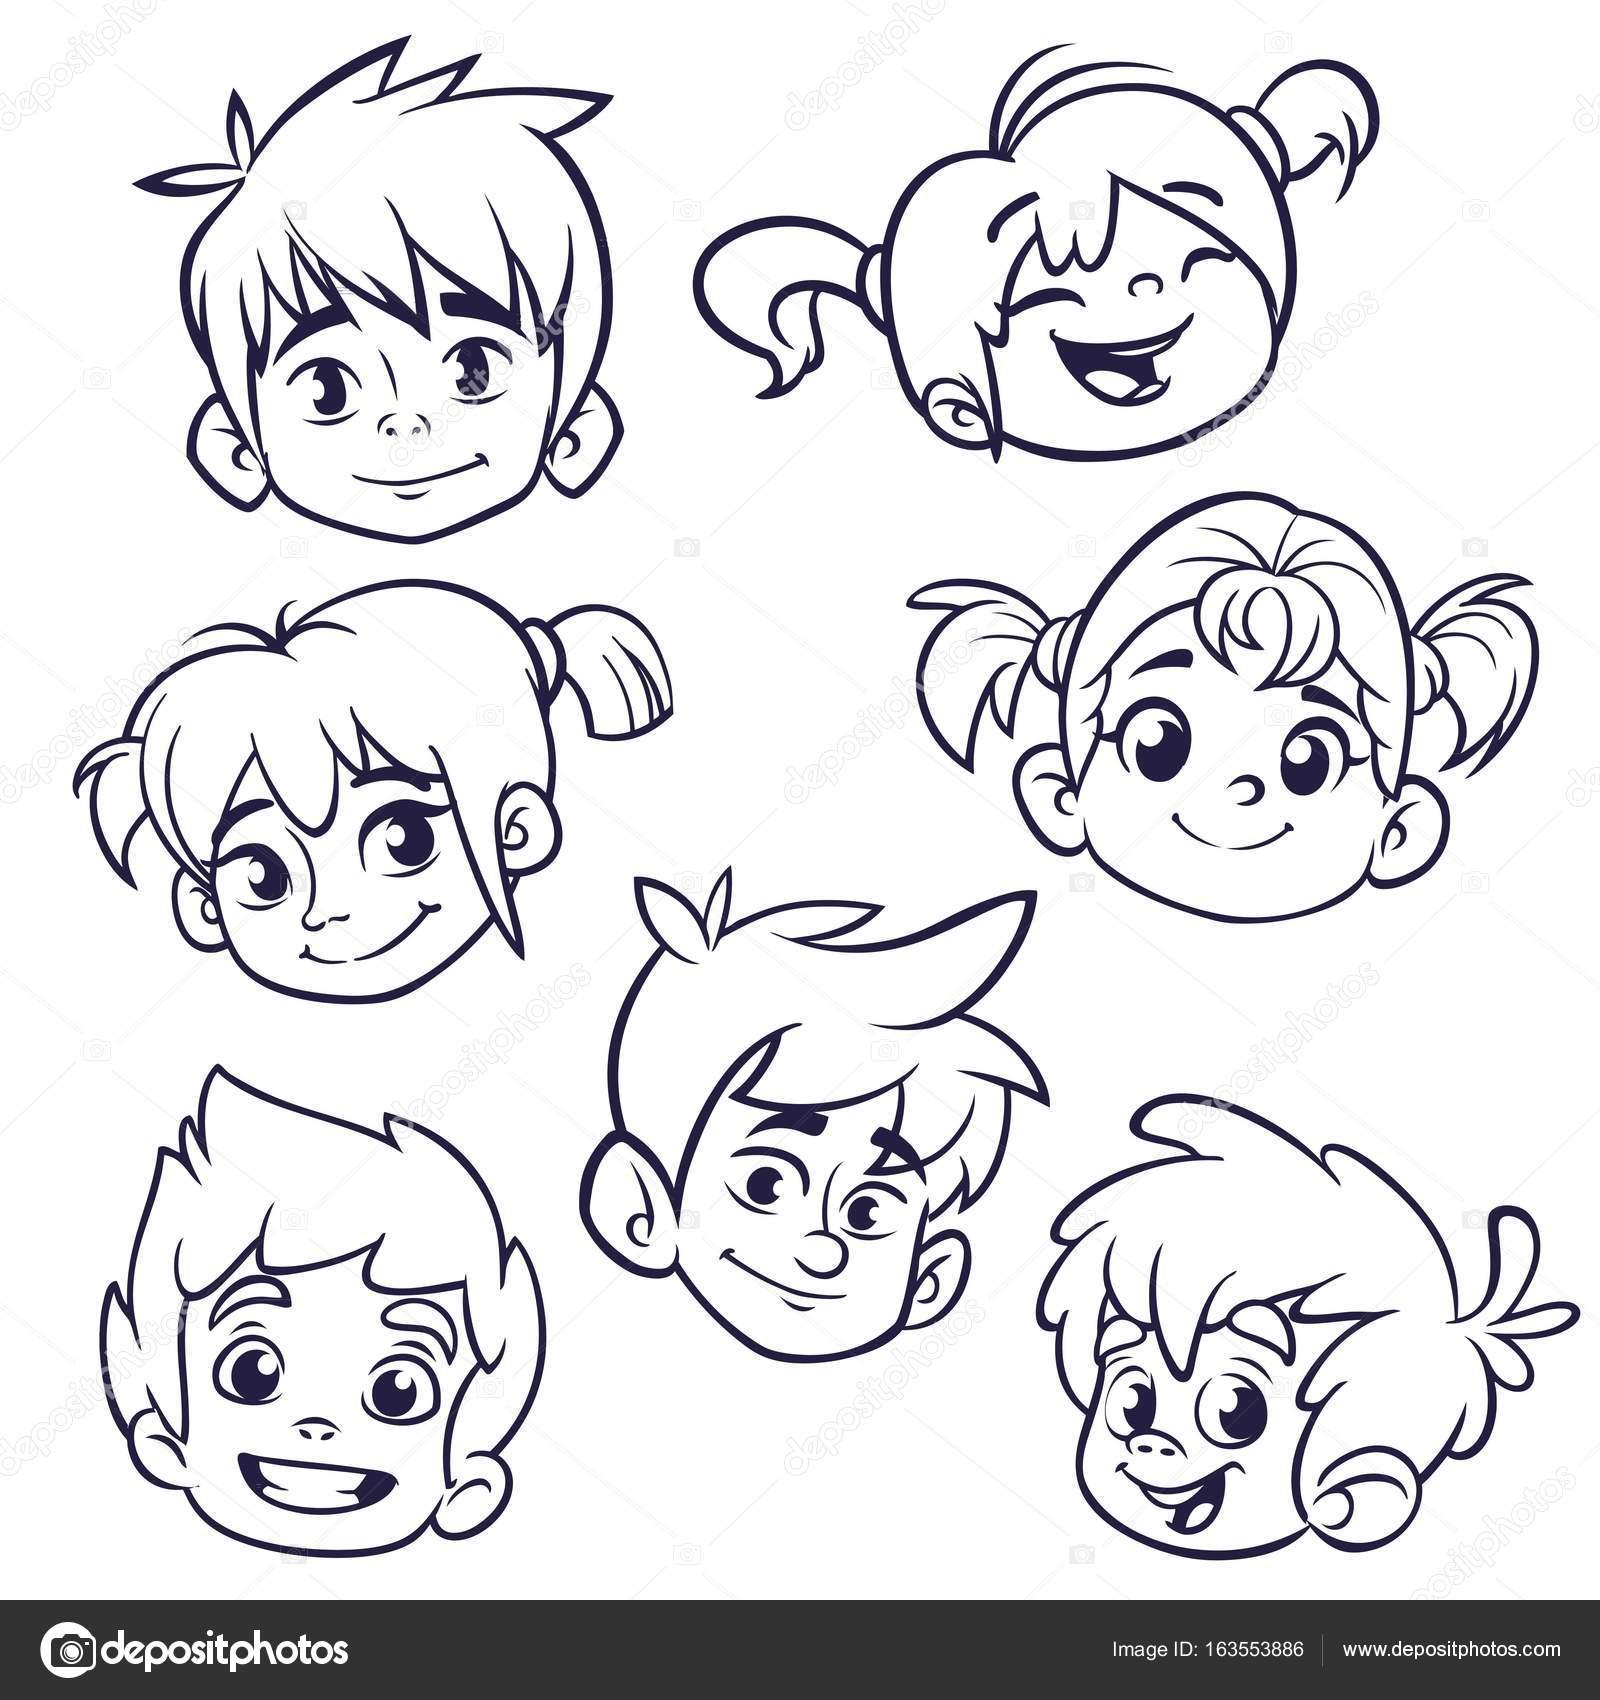 Animado Cara De Niño Para Colorear Dibujos Animados Iconos De